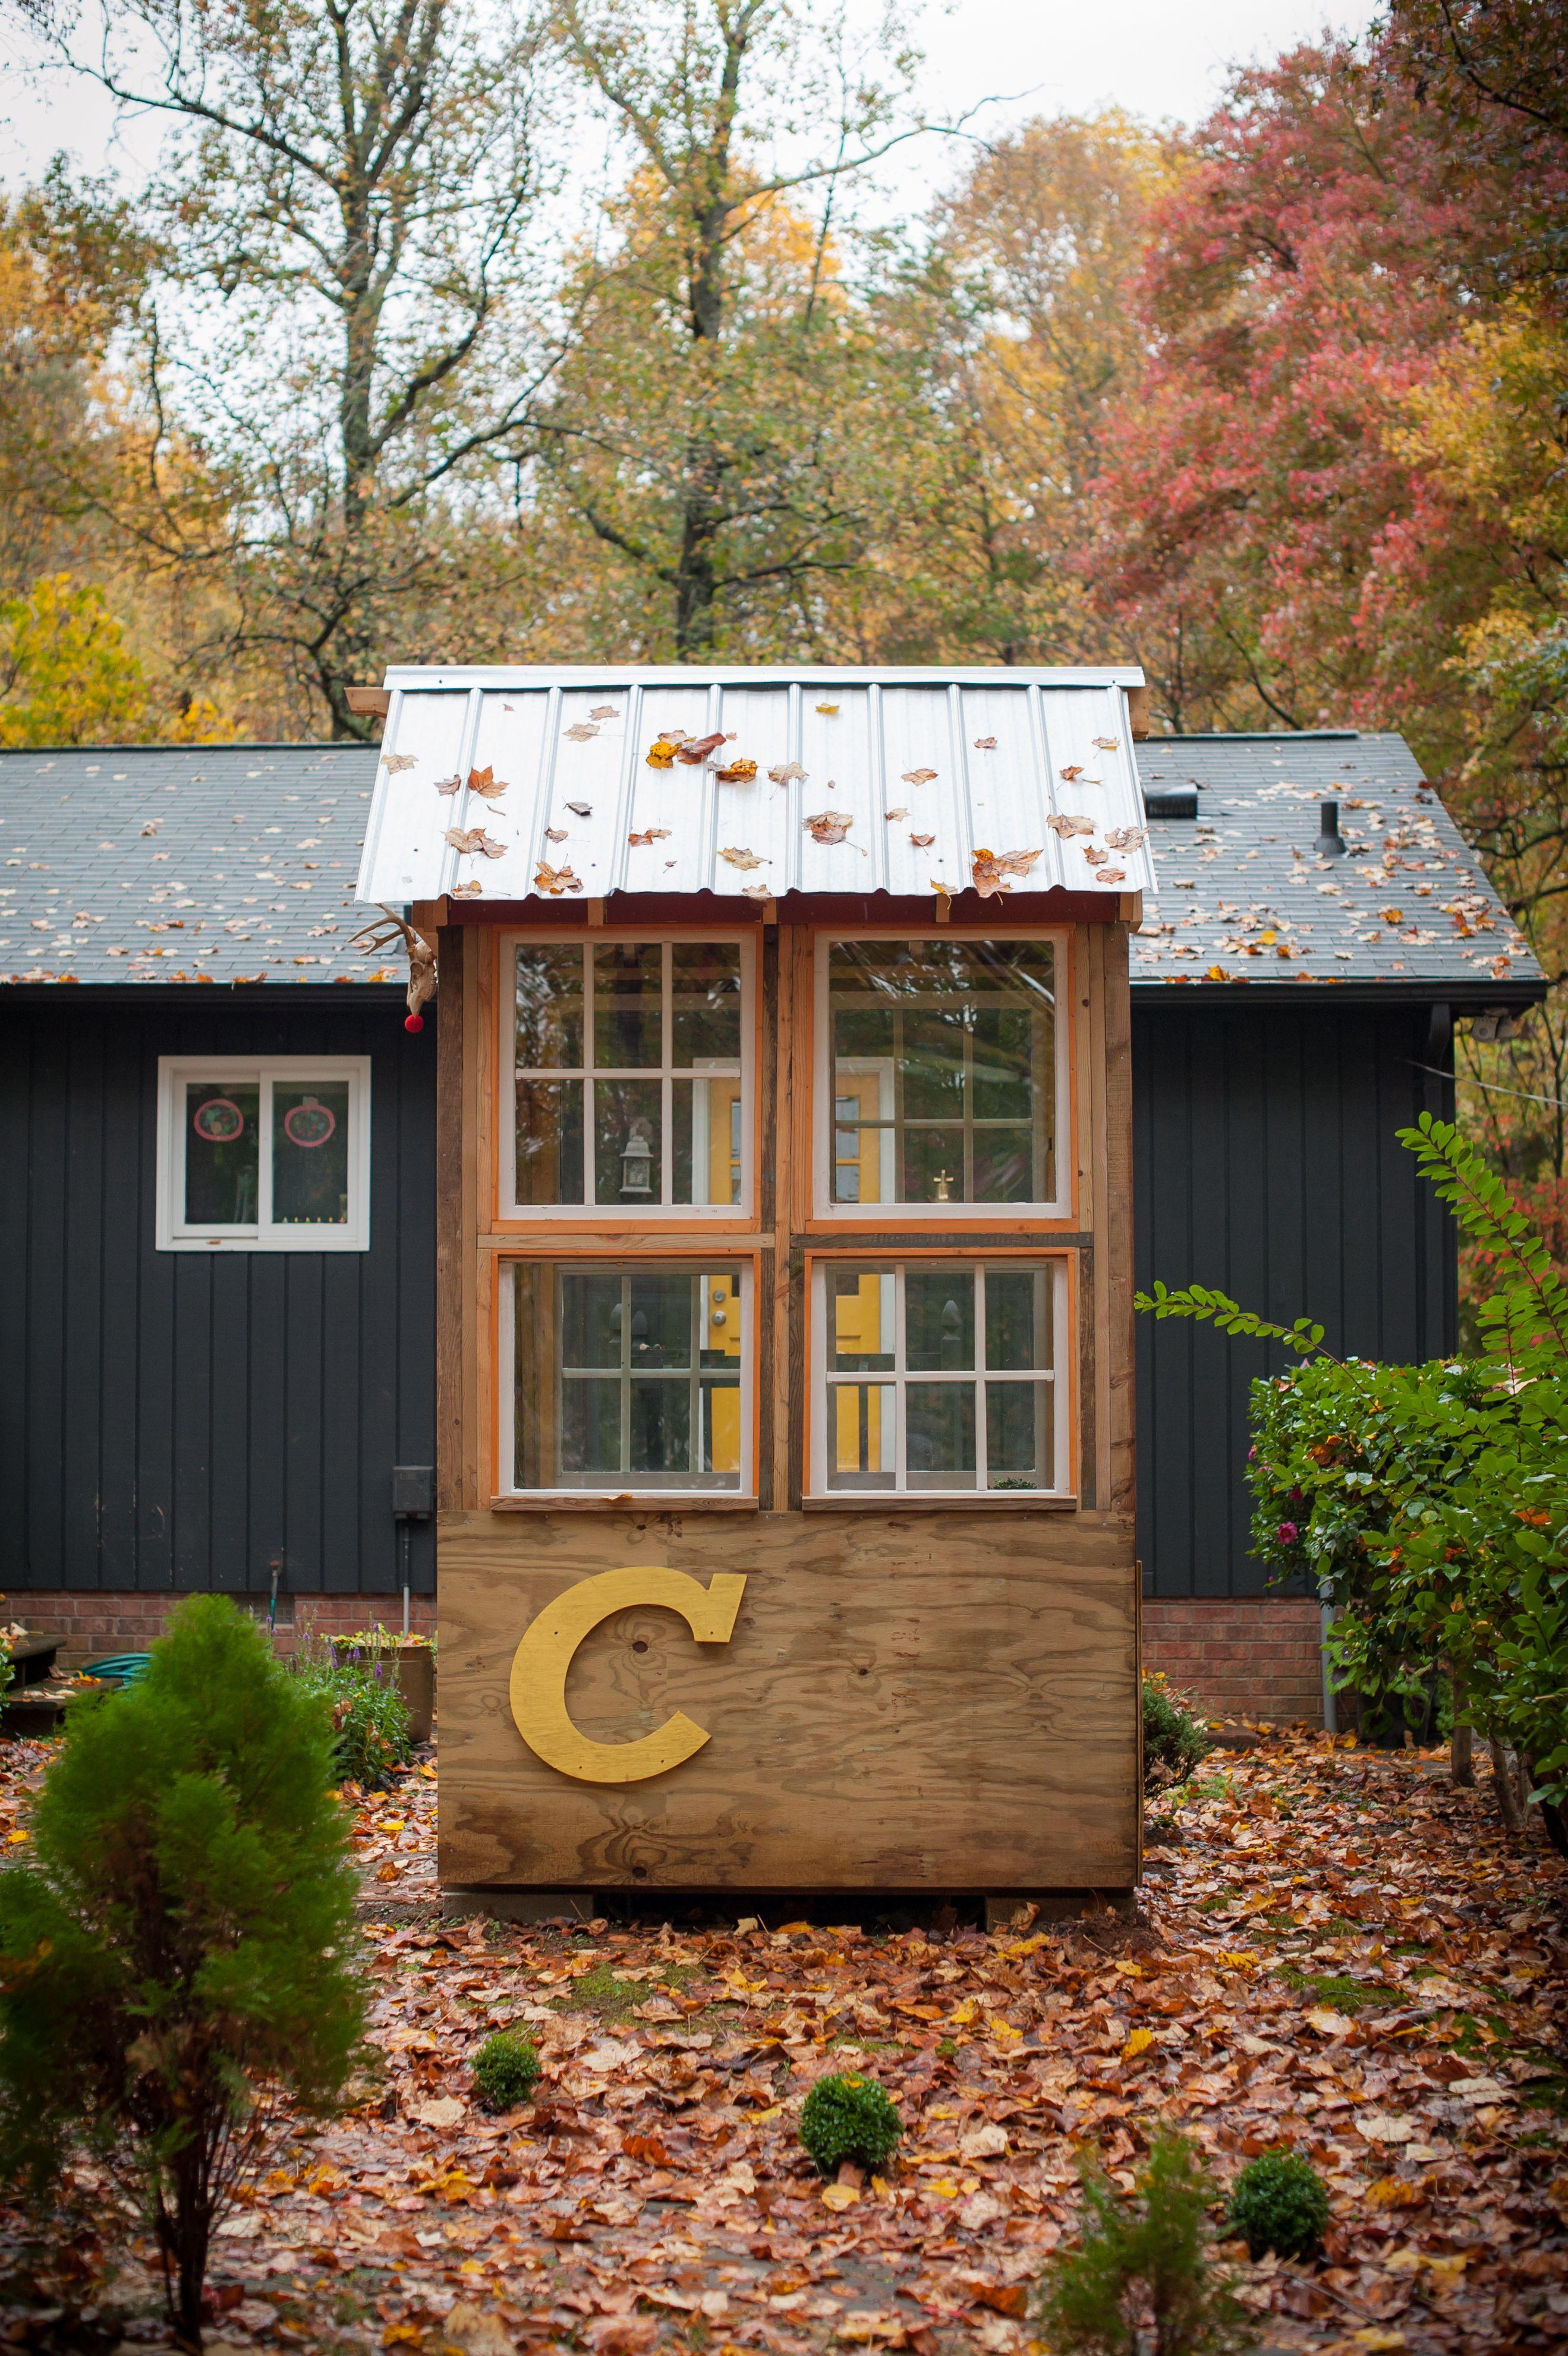 our tiny backyard sanctuary club house time out spot studio